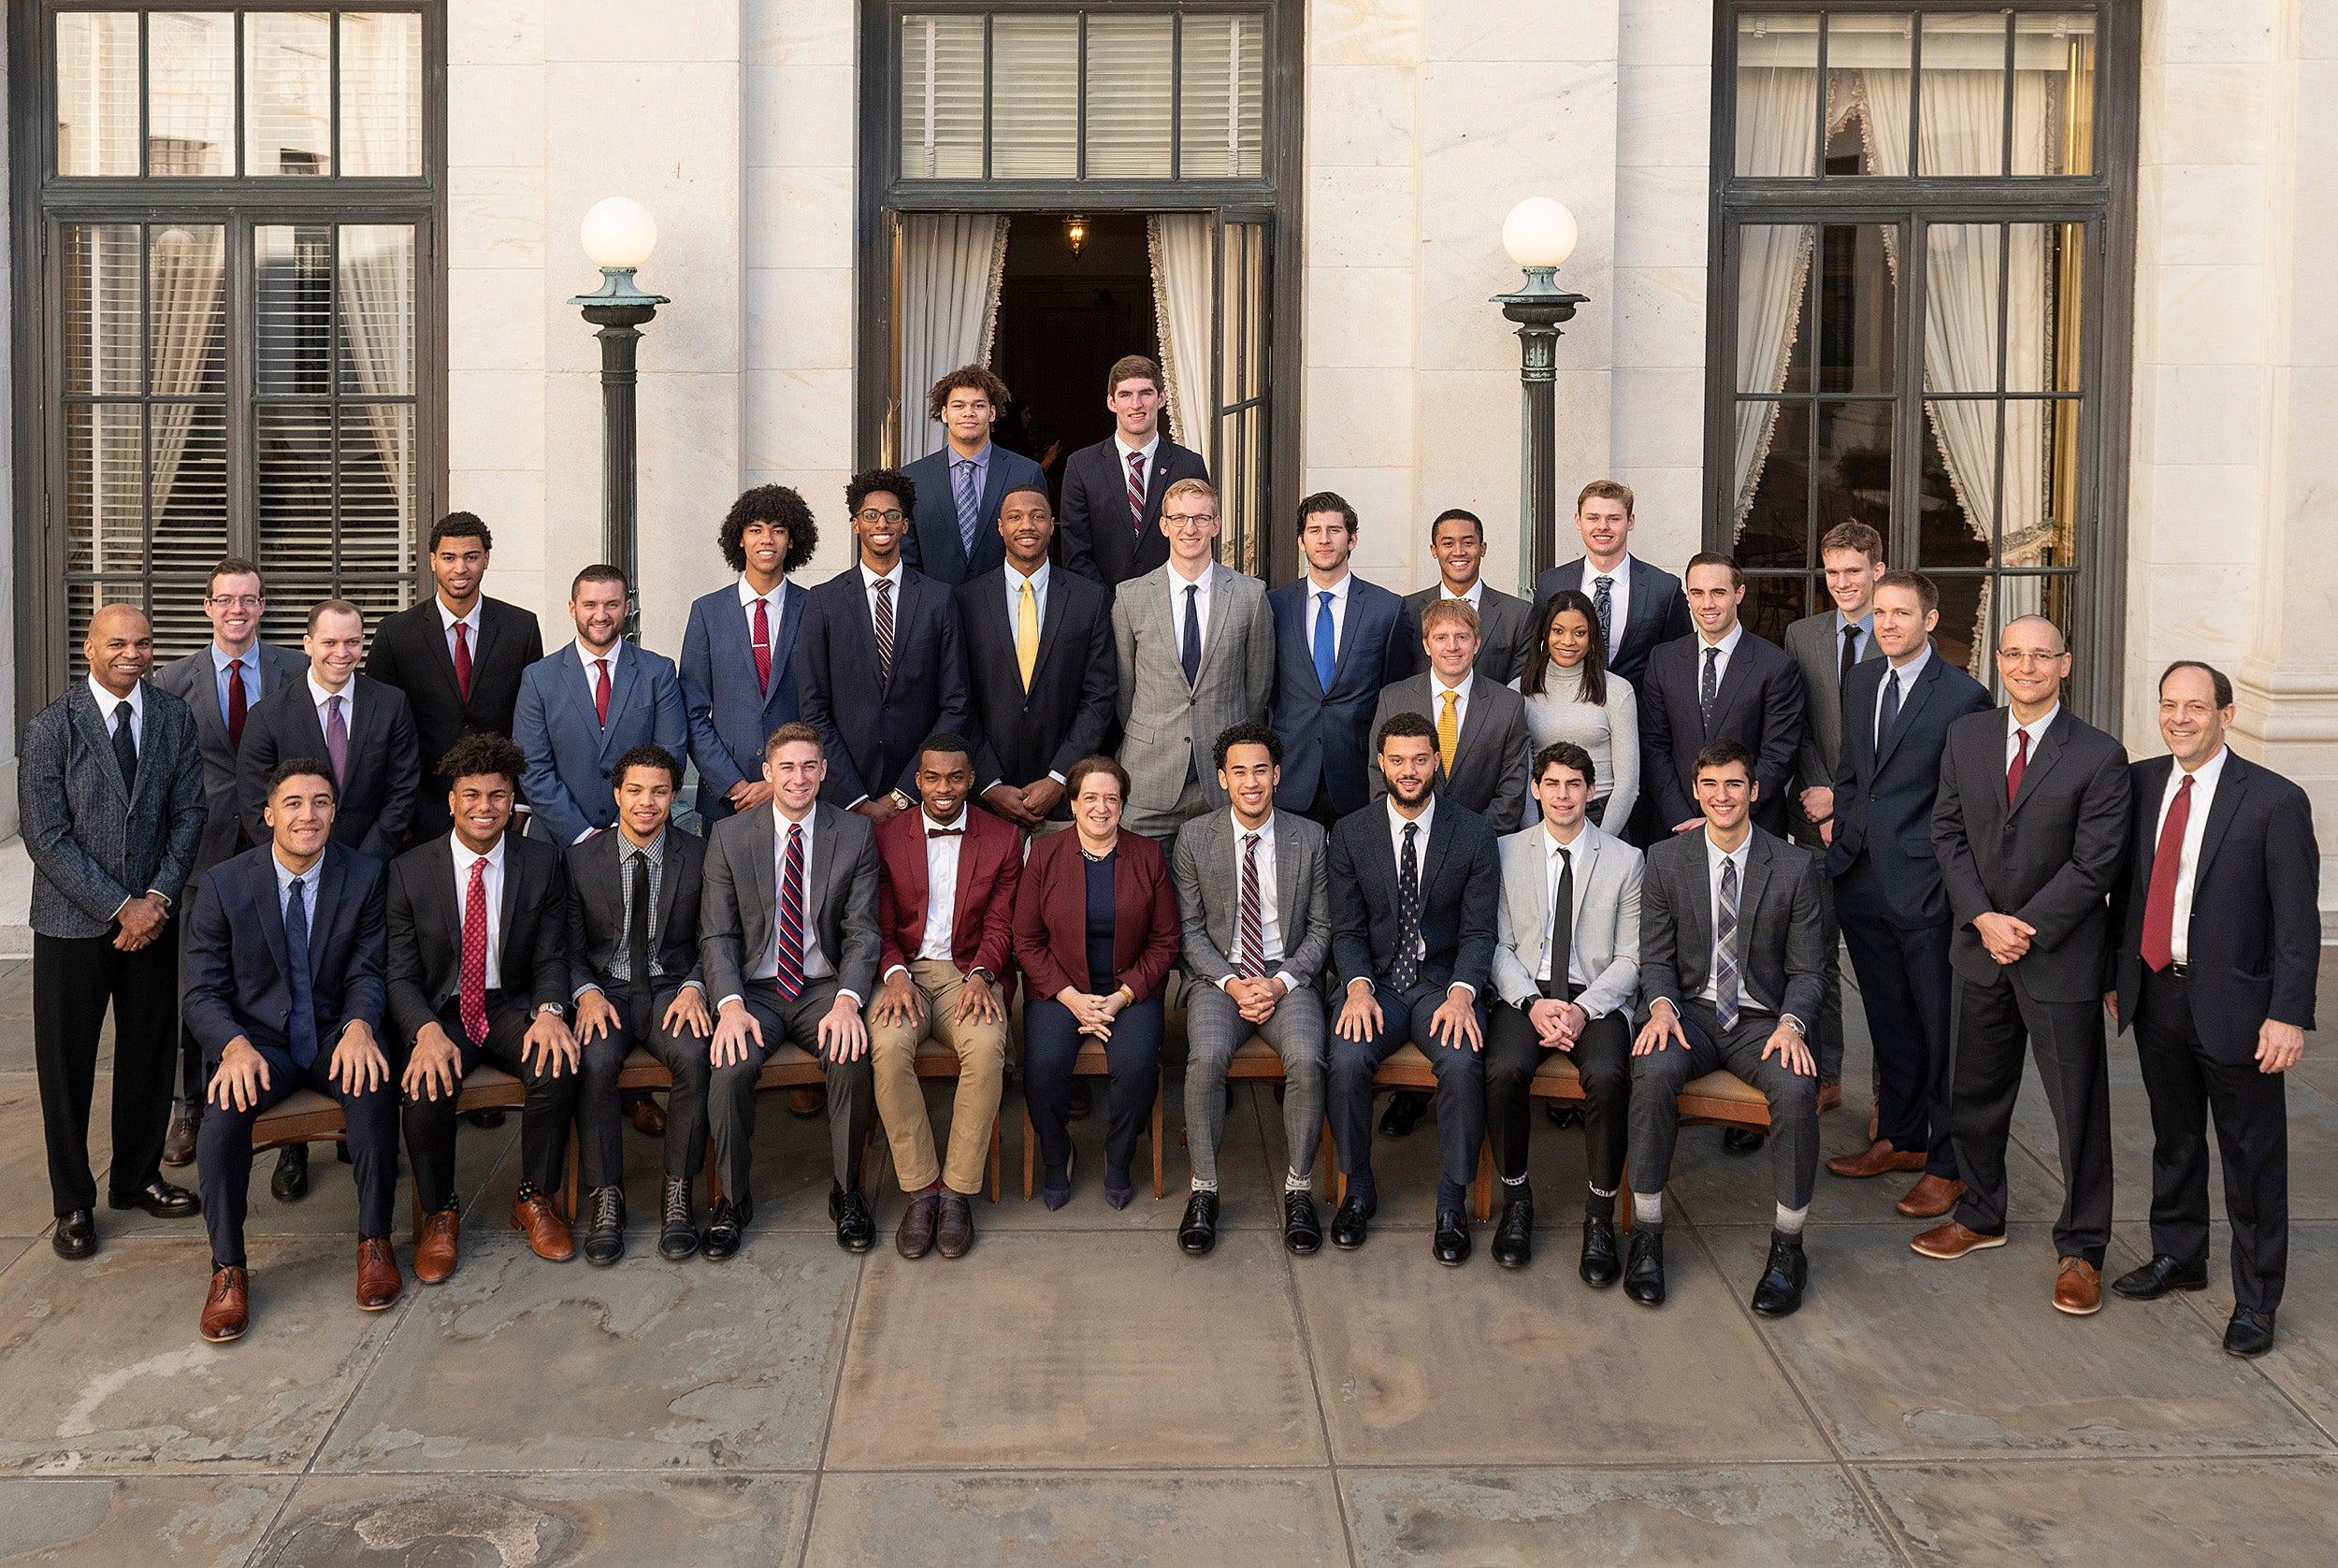 Harvard basketball team.